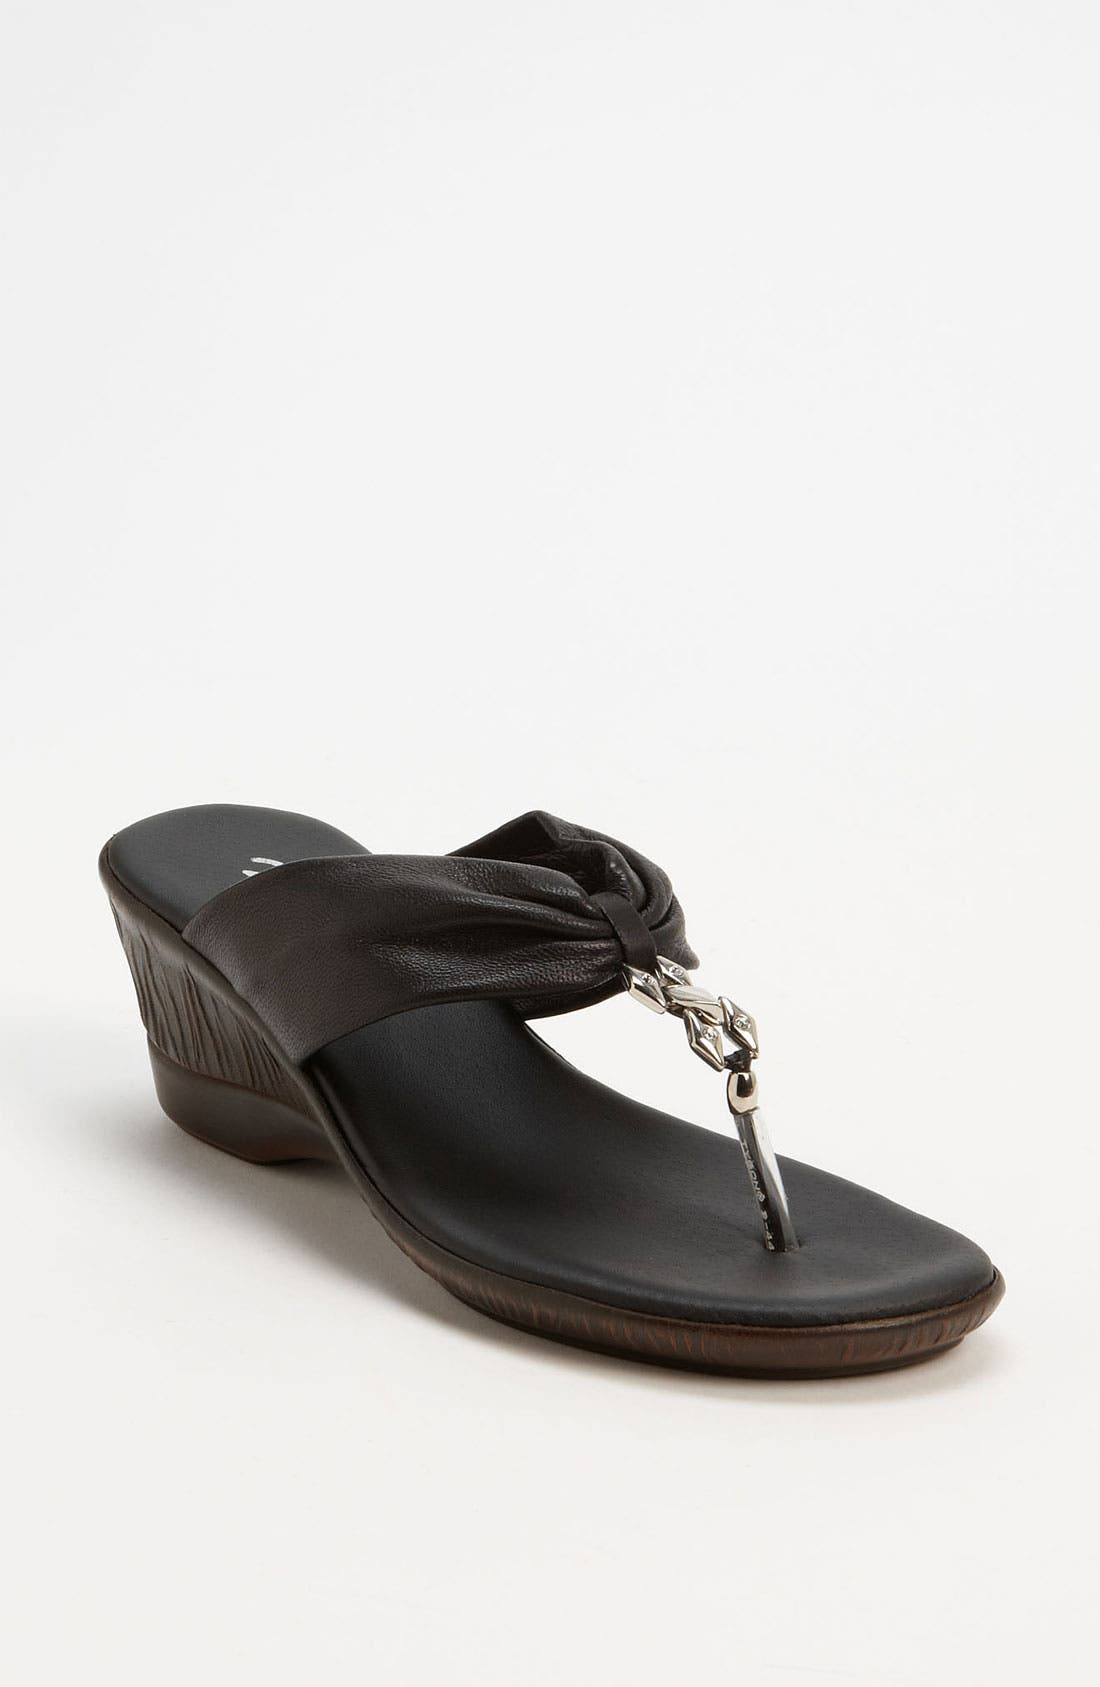 Main Image - Onex 'Jessie' Sandal